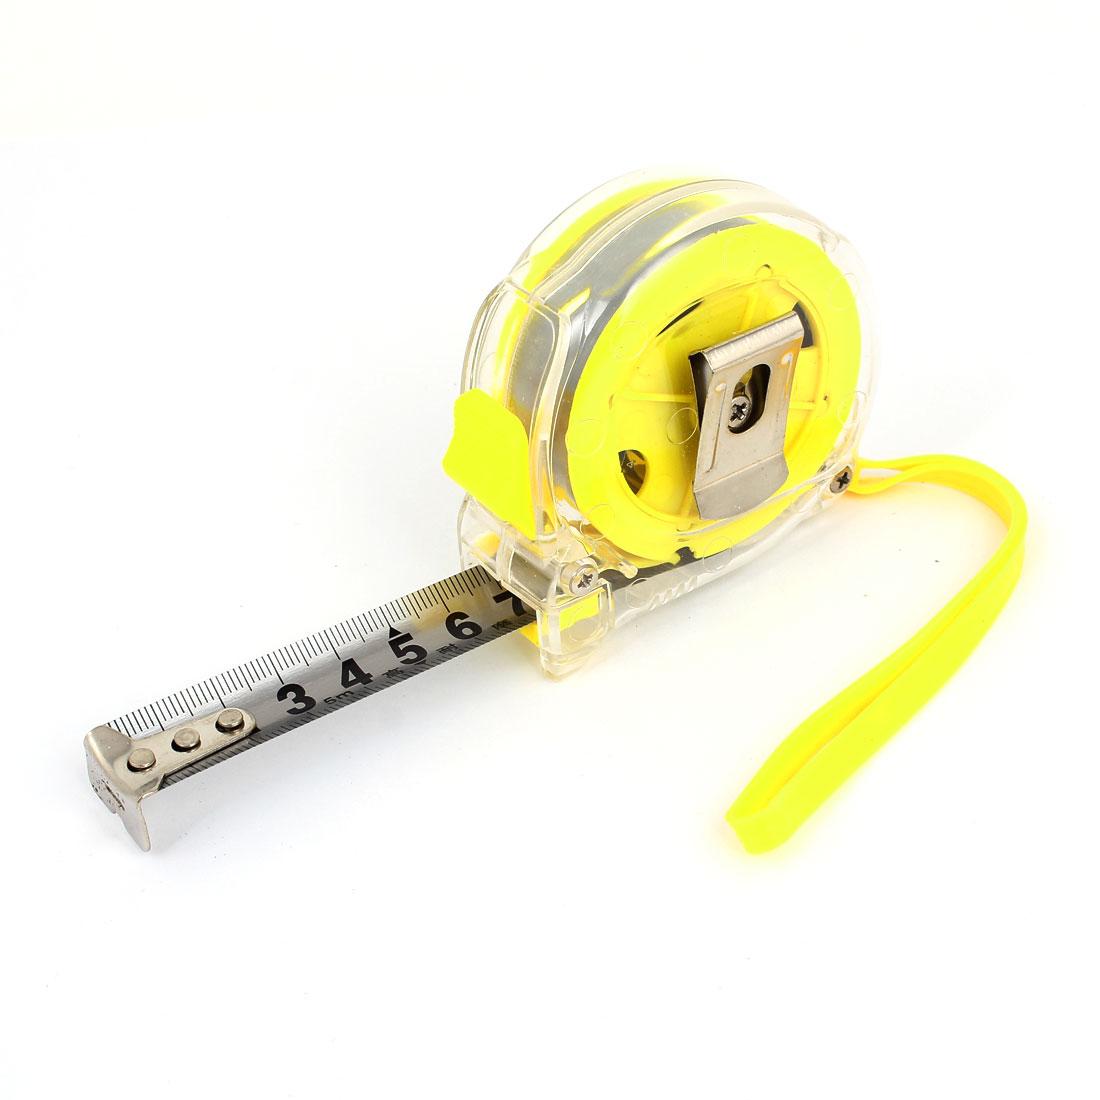 Clear Yellow Plastic Housing Retractable Metric Ruler Range Measuring Measure Tape 5M